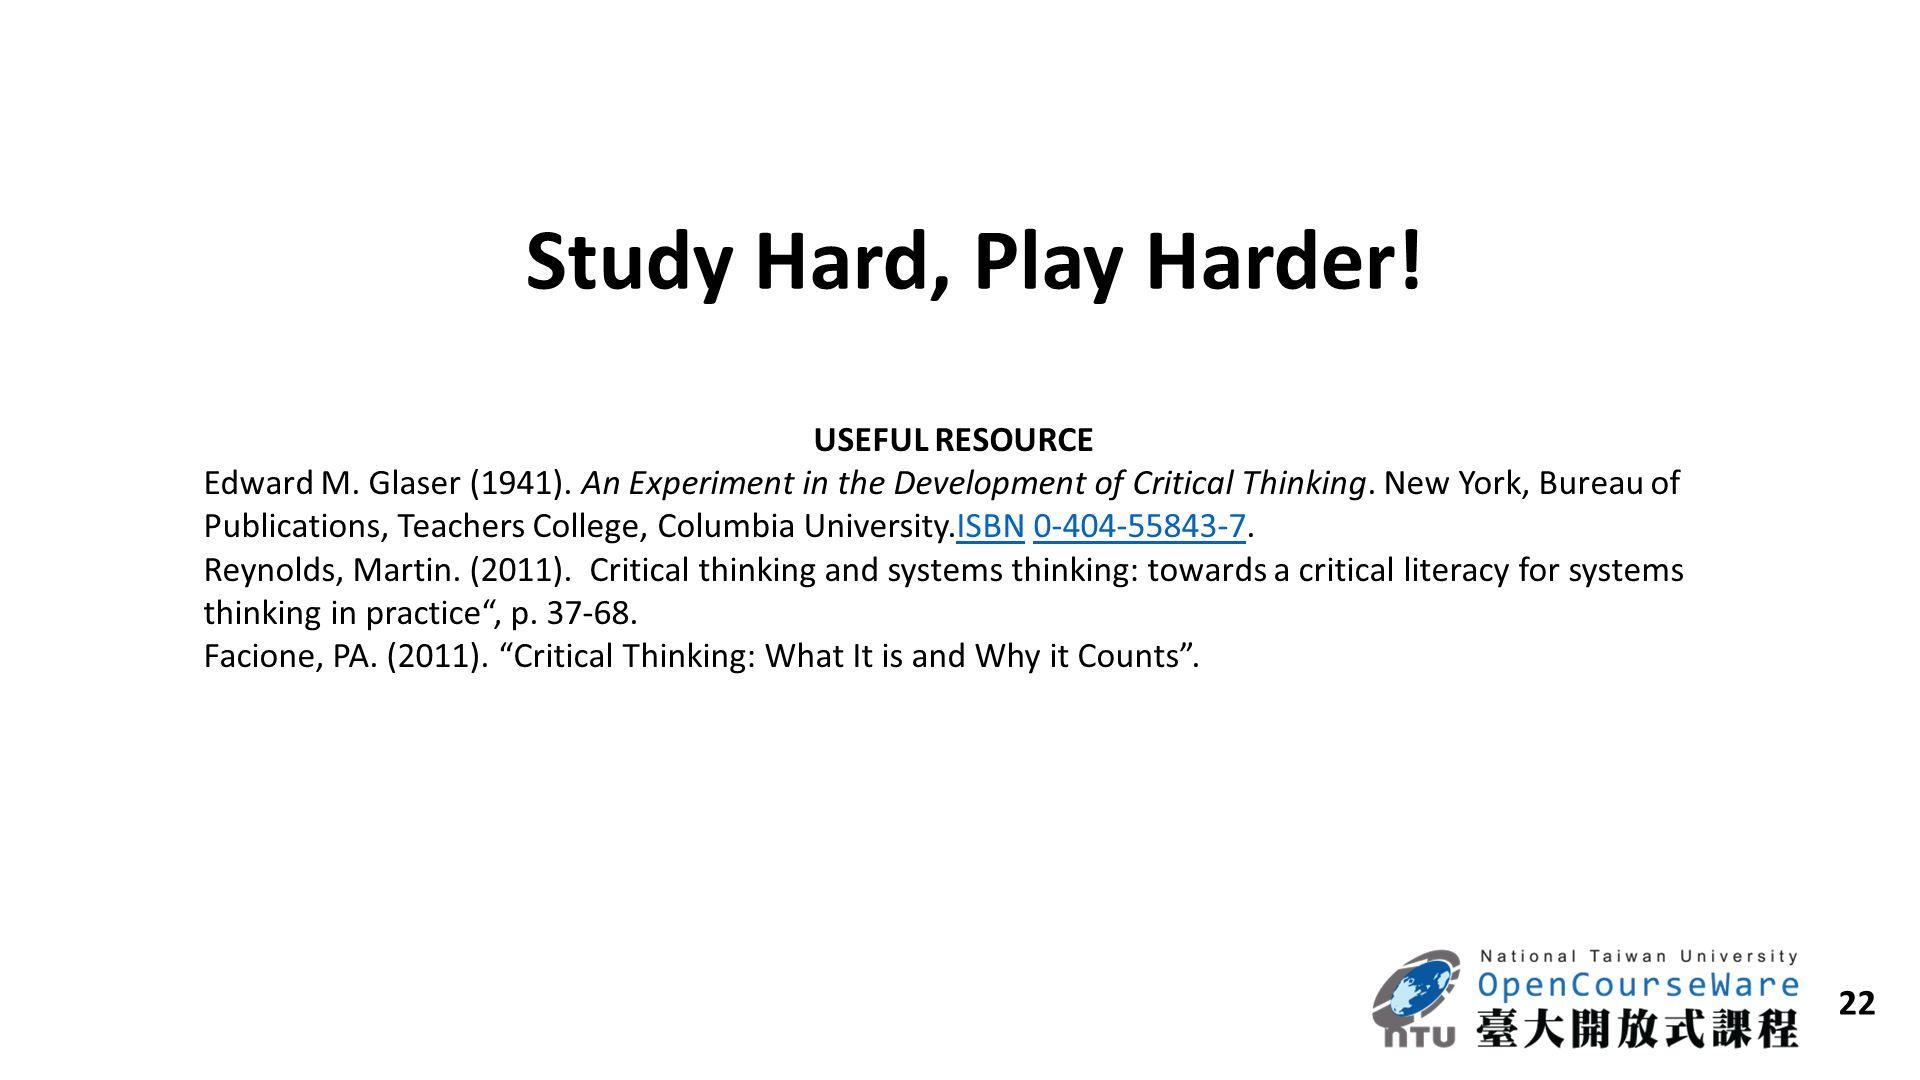 Study Hard, Play Harder! USEFUL RESOURCE